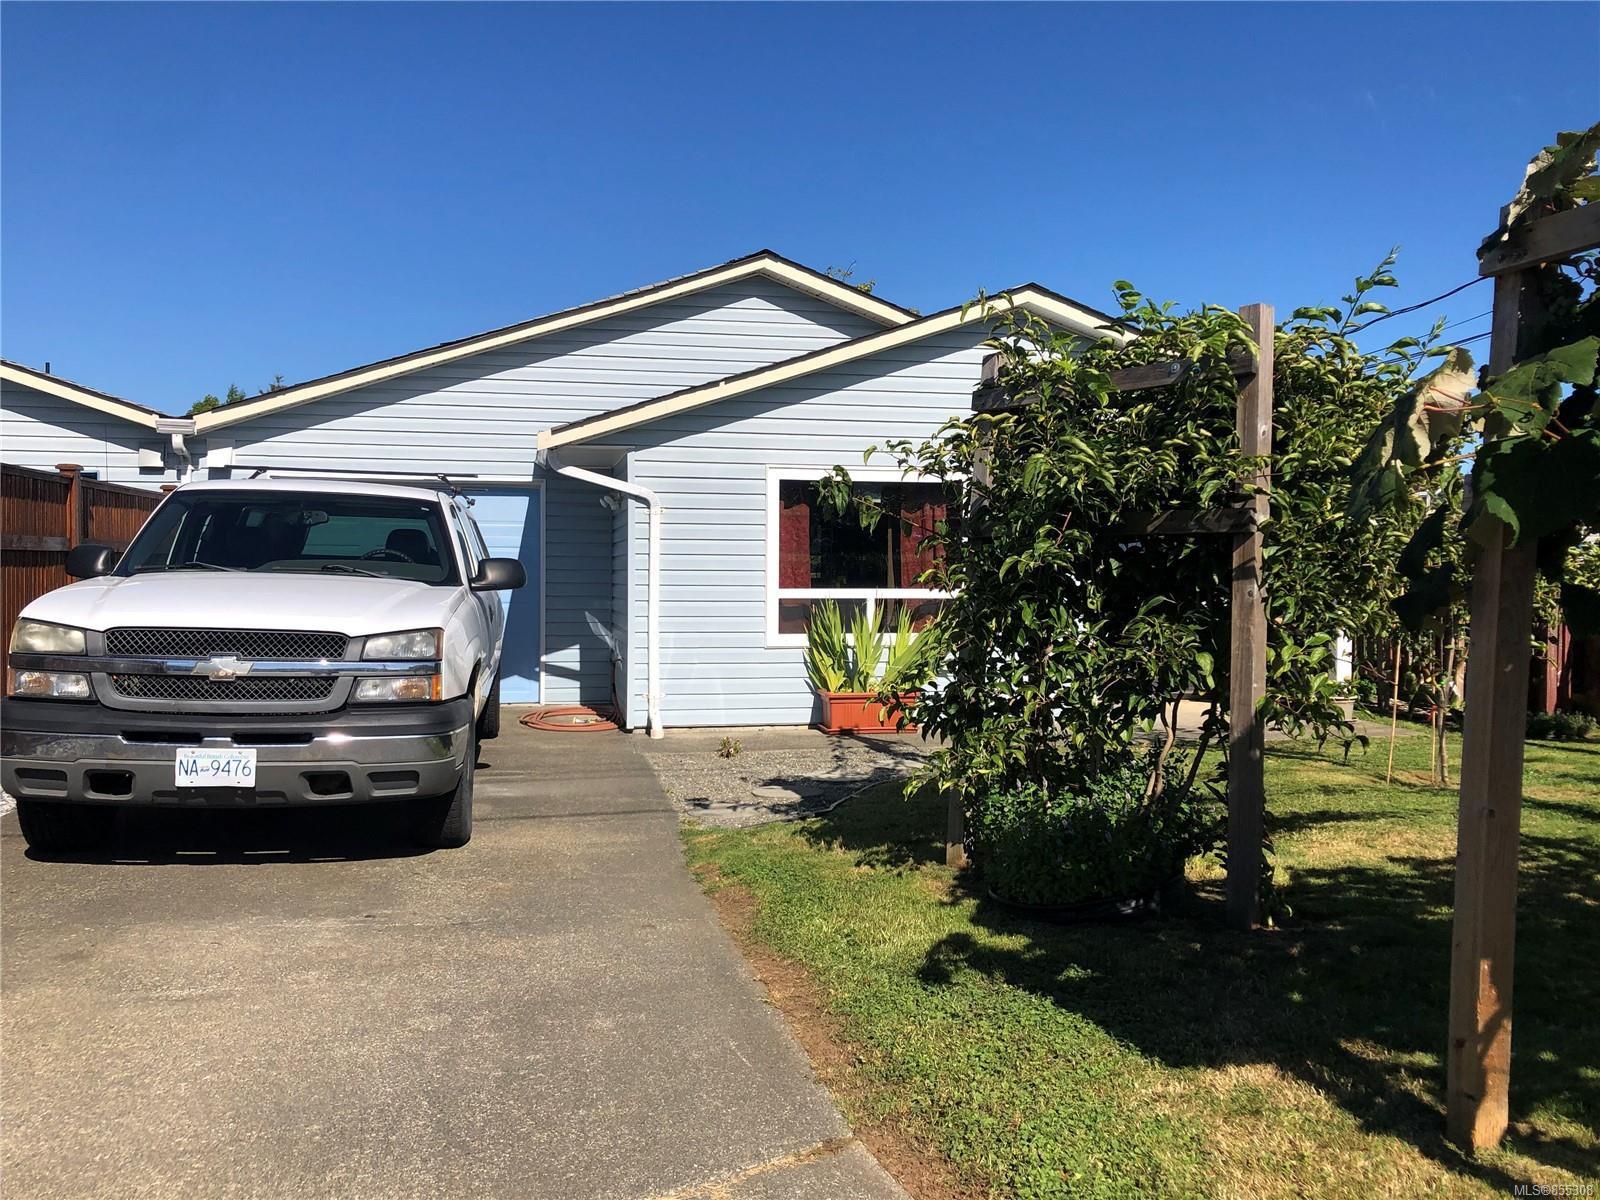 Main Photo: B 1140 Edgett Rd in : CV Courtenay City Half Duplex for sale (Comox Valley)  : MLS®# 855308